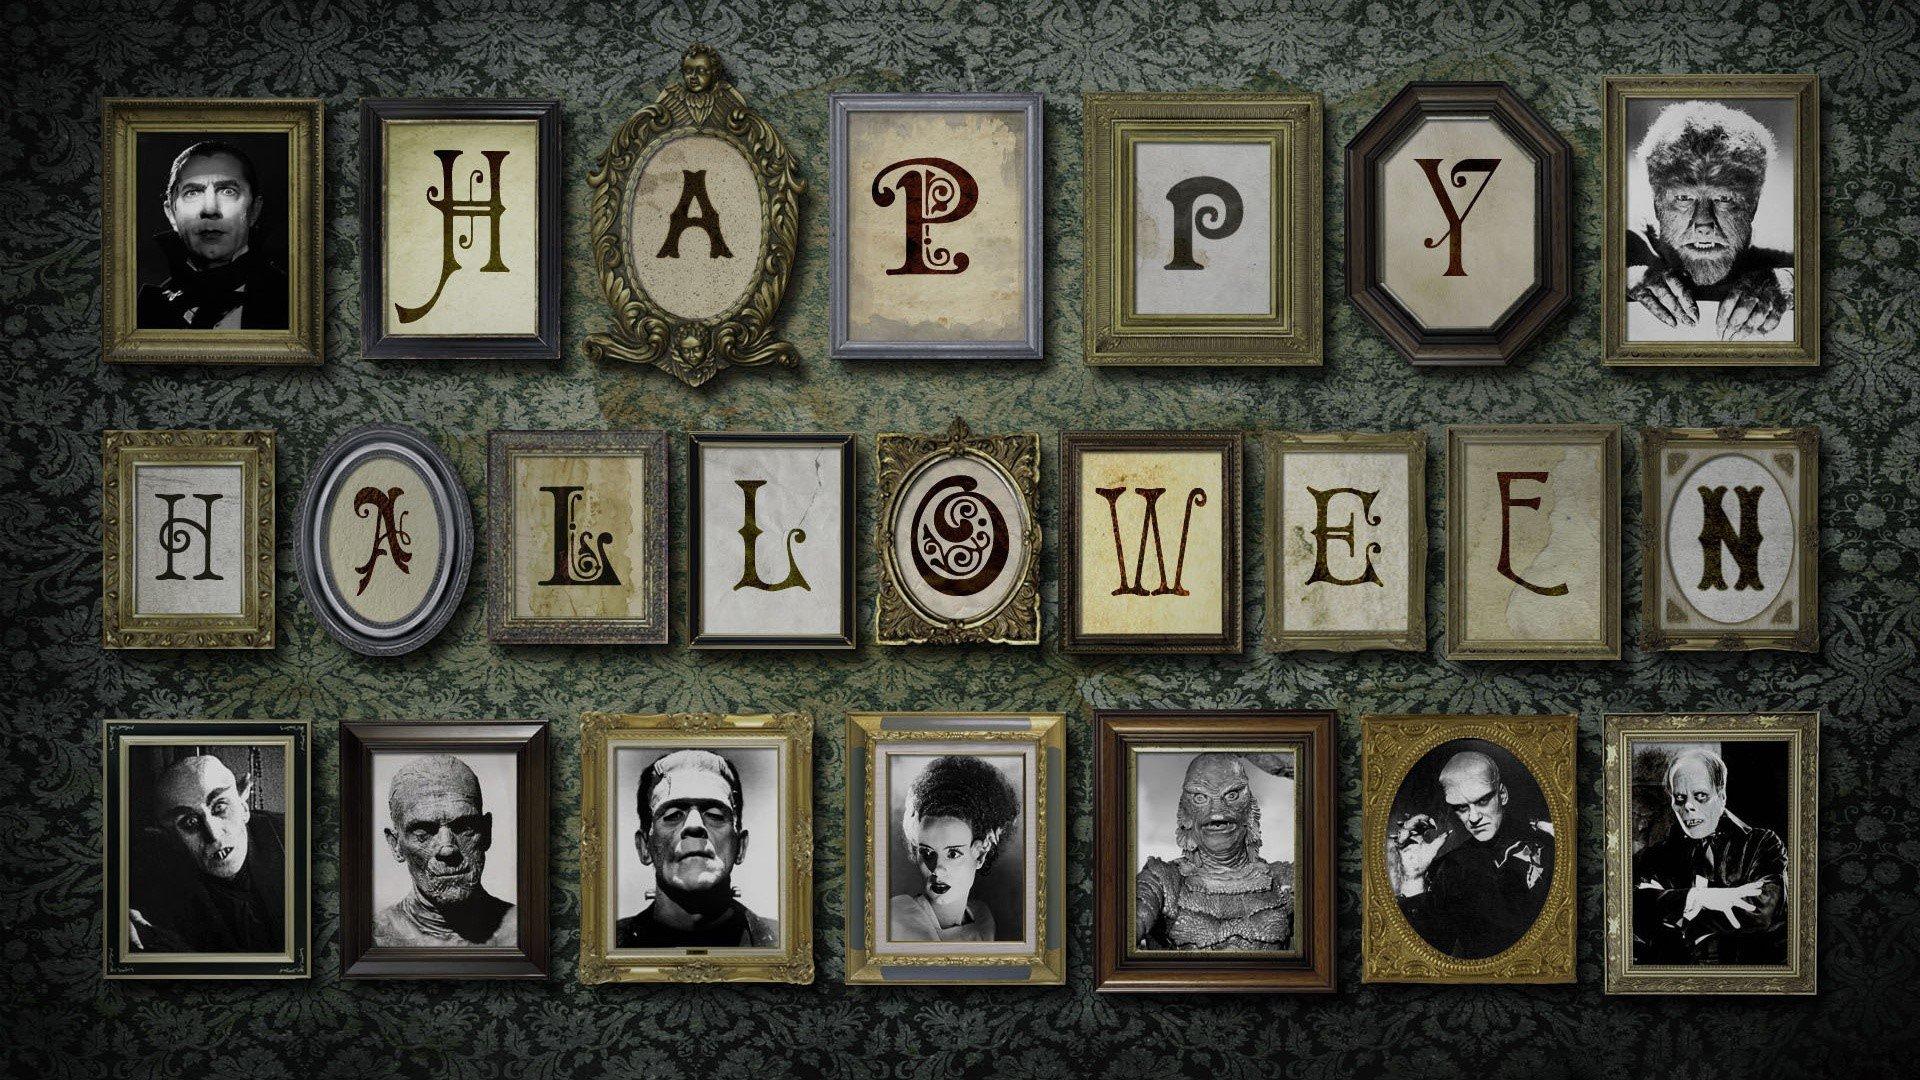 Fondo de pantalla de Monstruos de halloween Imágenes